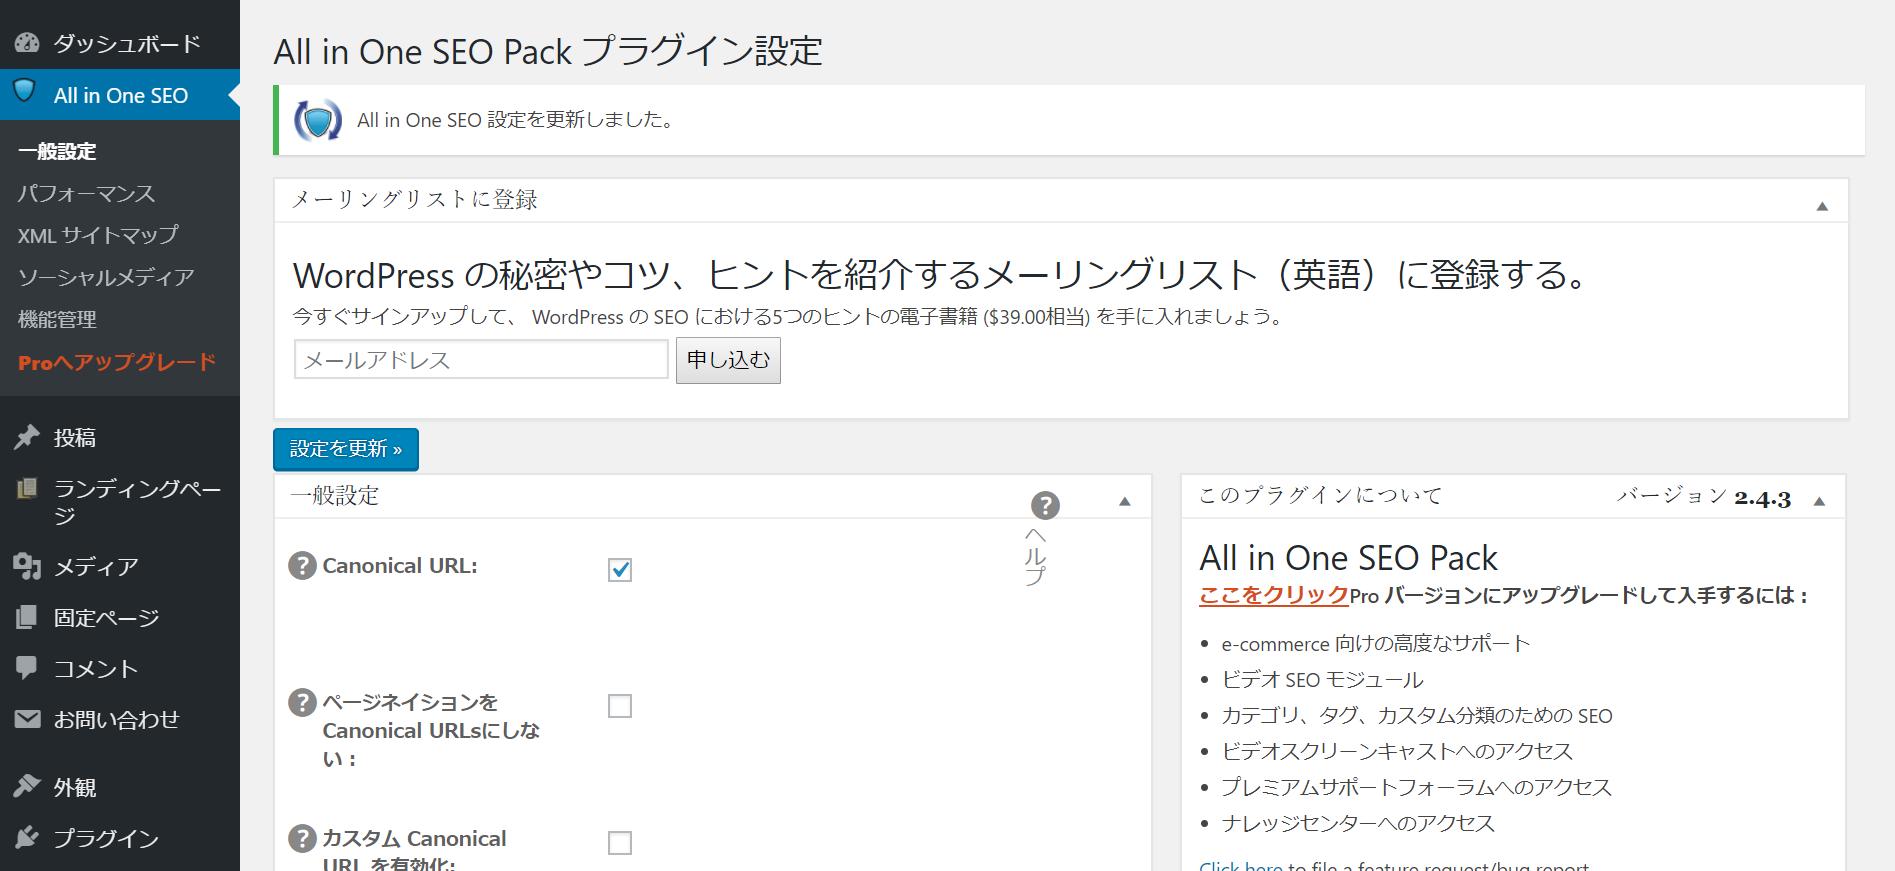 AllinOneSEO一般設定設定更新 (2)